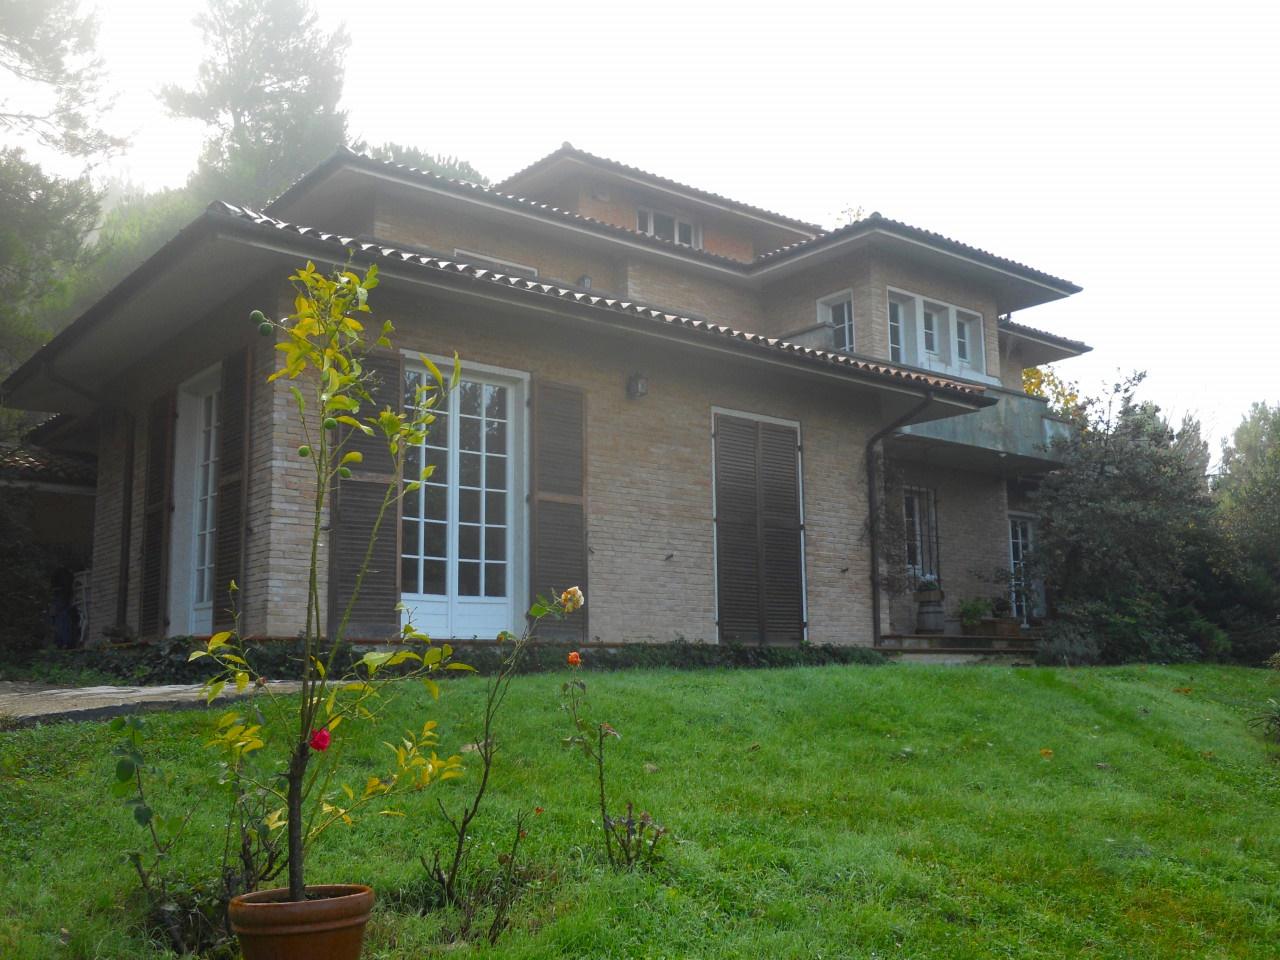 Zona Sappanico Villa Singola con giardino recintato esclusivo e piantumato